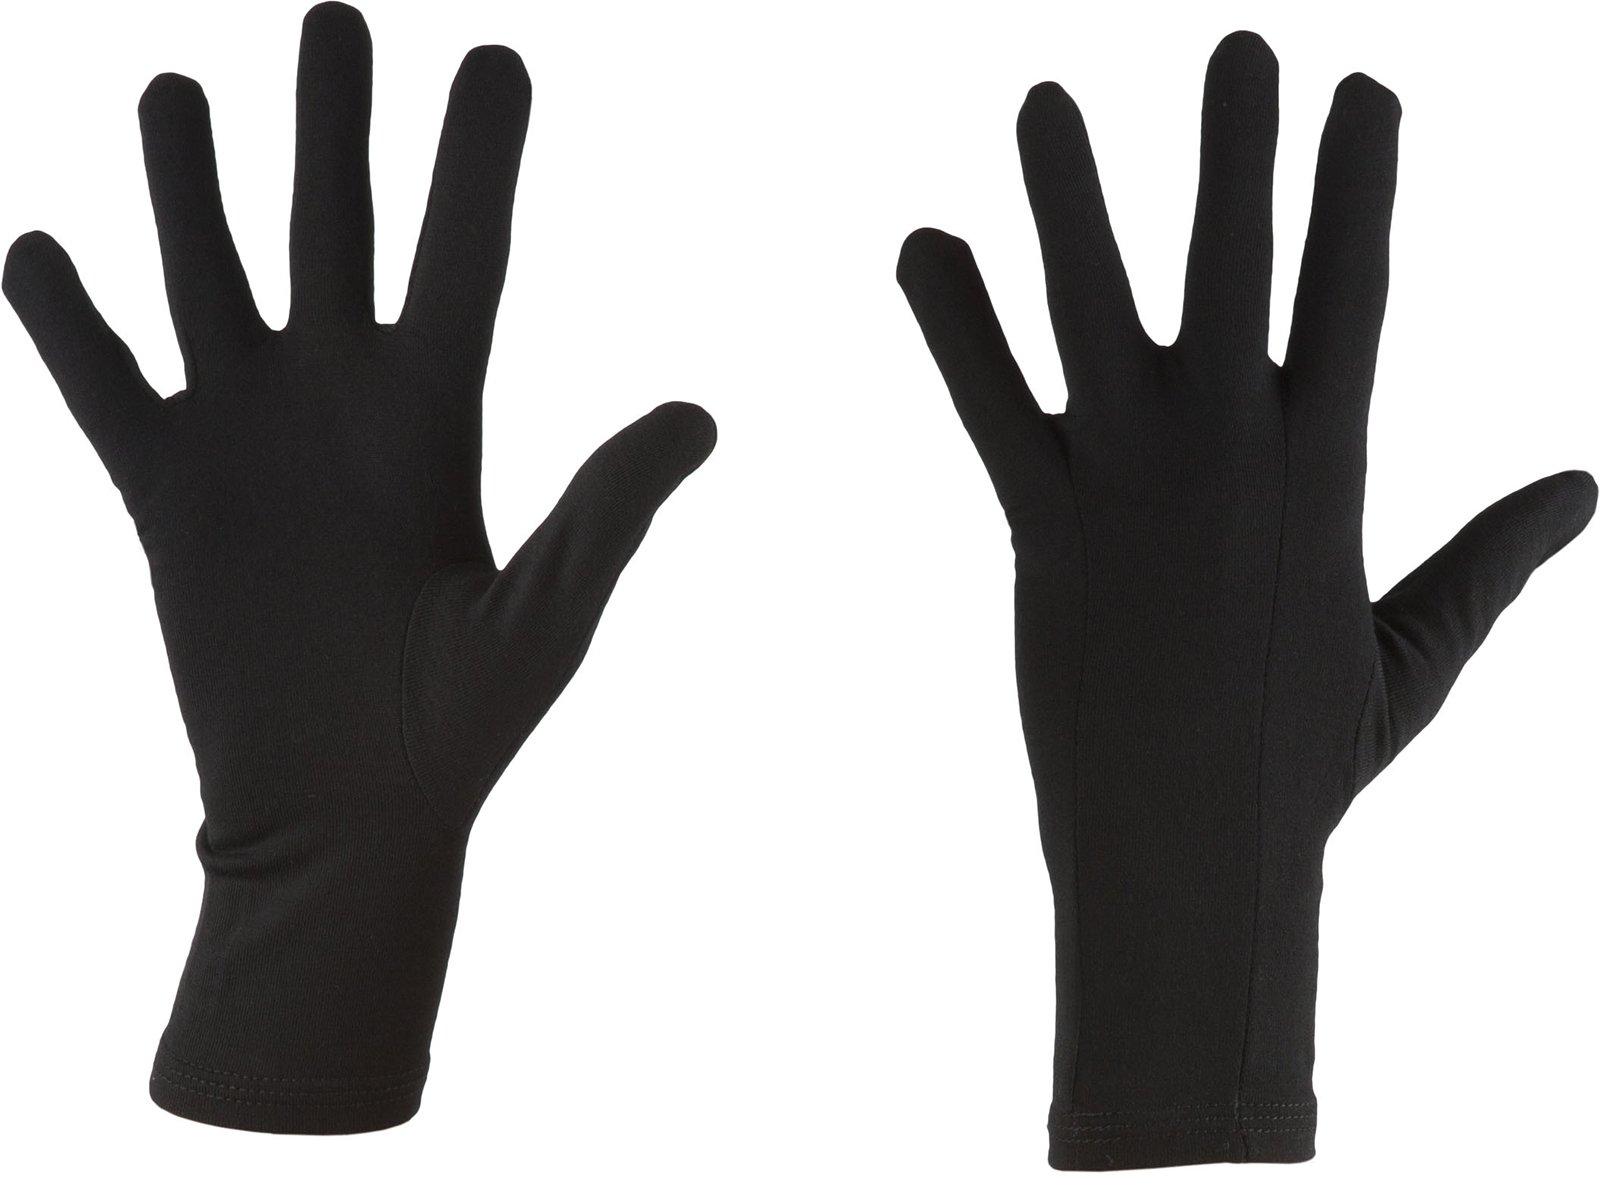 Icebreaker Merino Unisex Adult 200 Oasis Glove Liner, Black, L by Icebreaker Merino (Image #2)